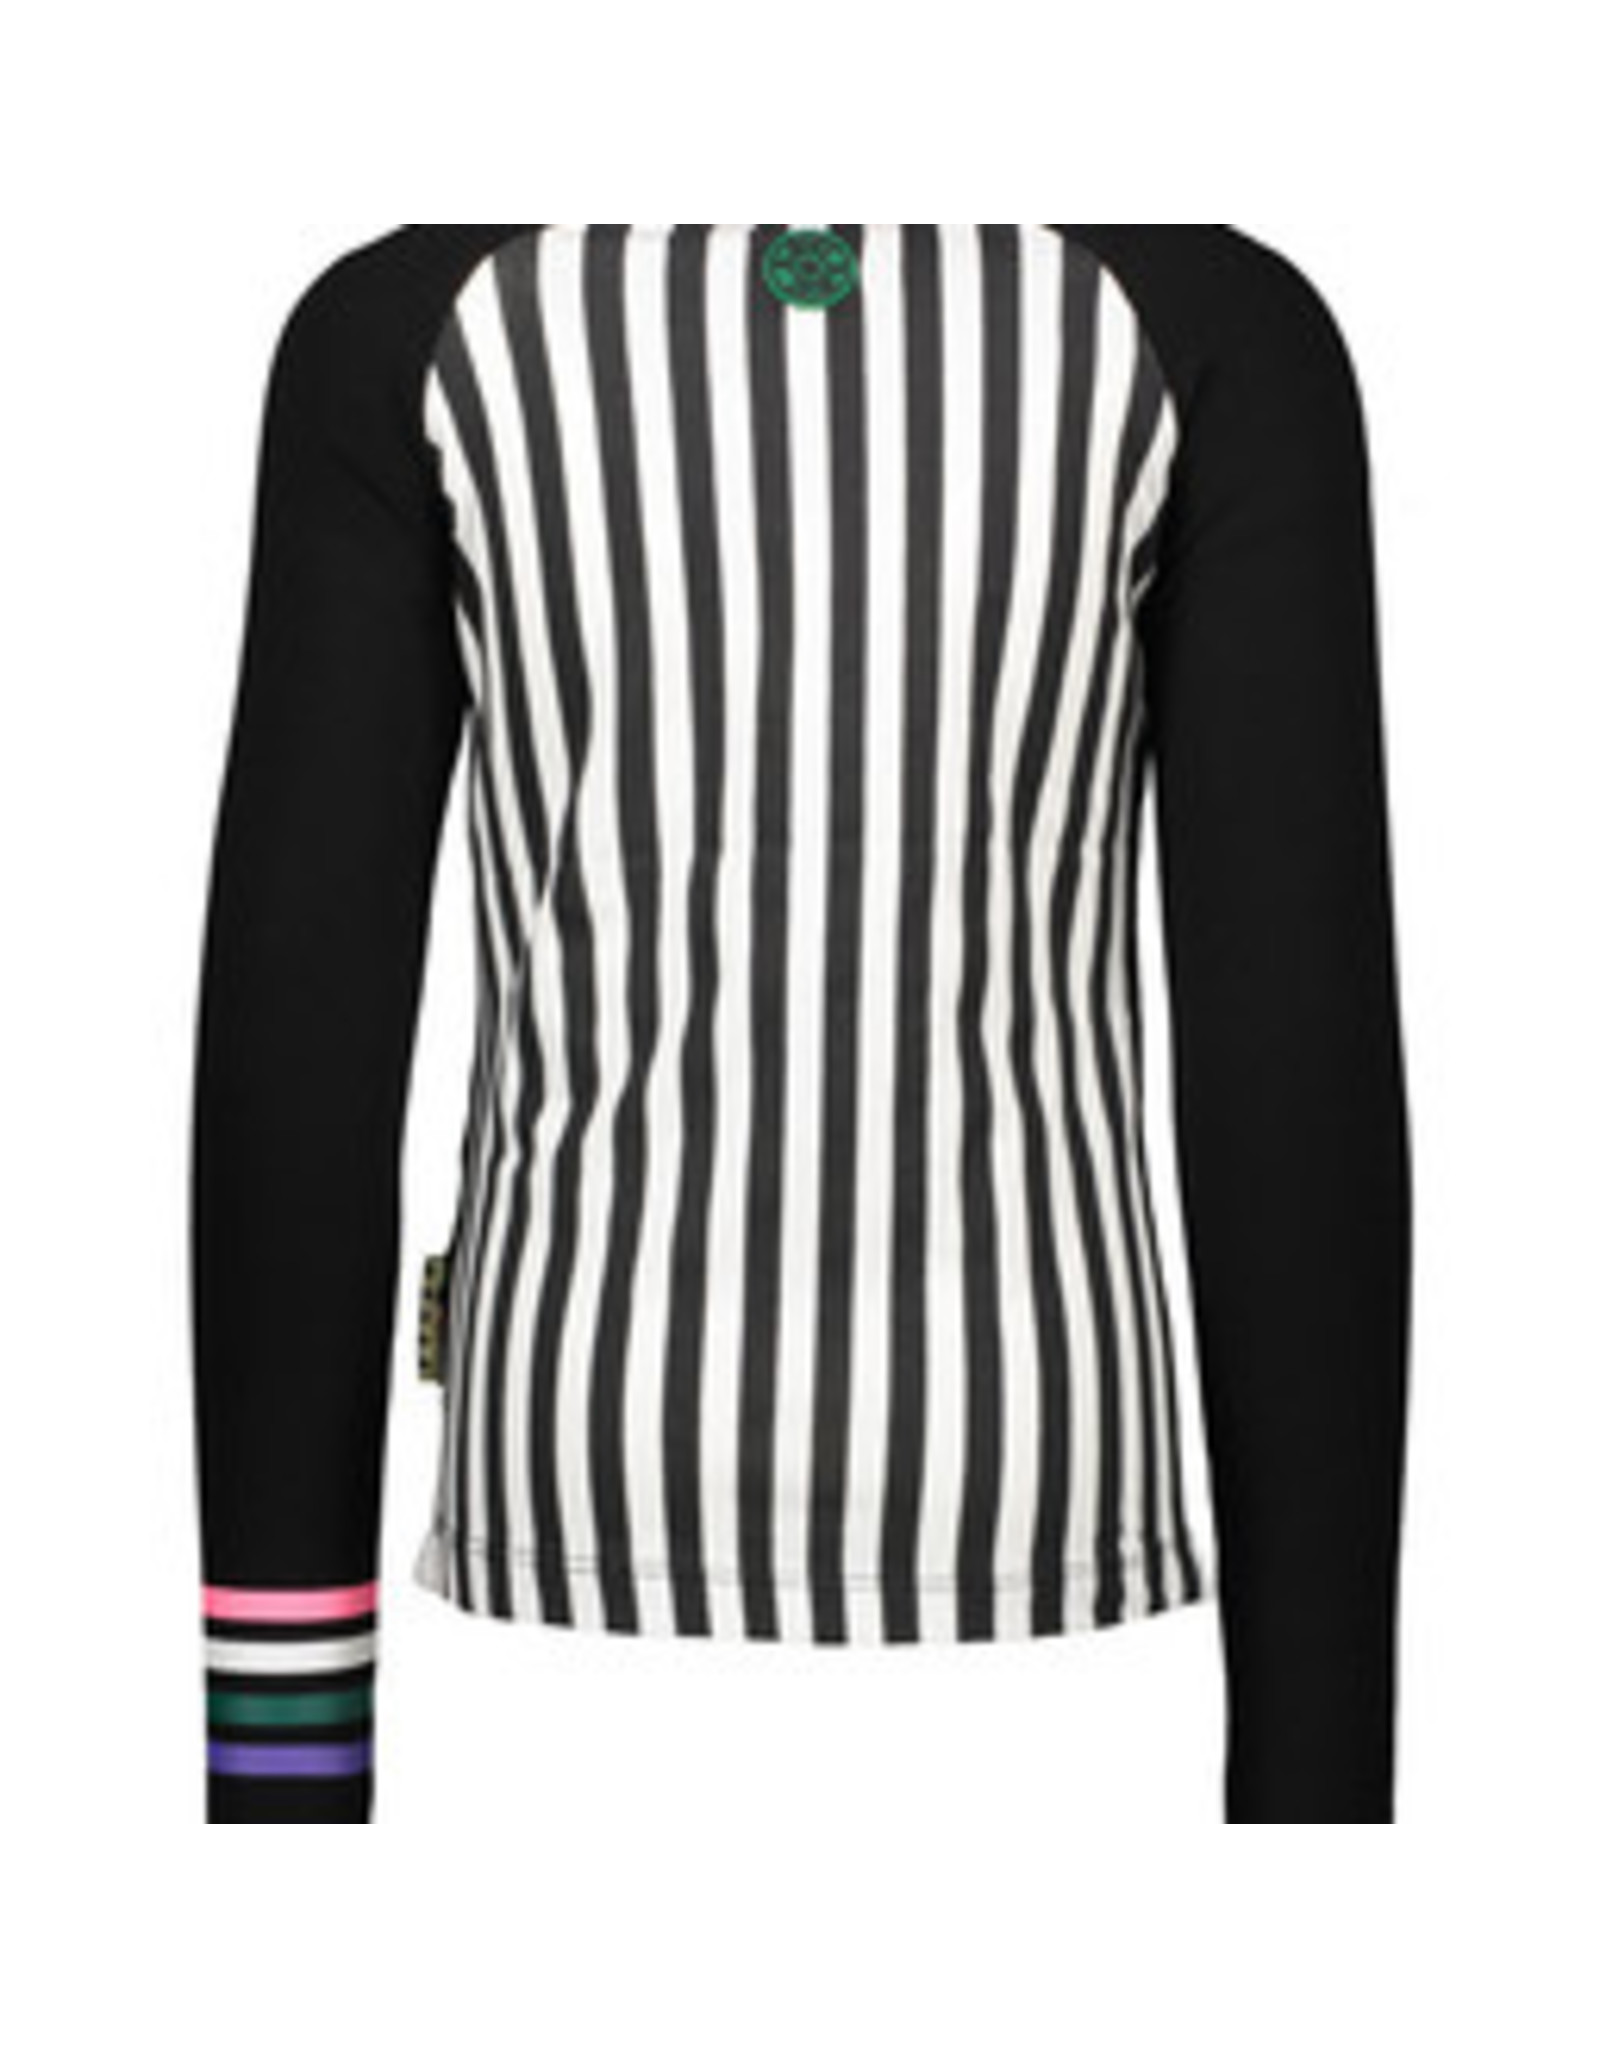 B.Nosy Girls raglan shirt with panel print zebra/stripe